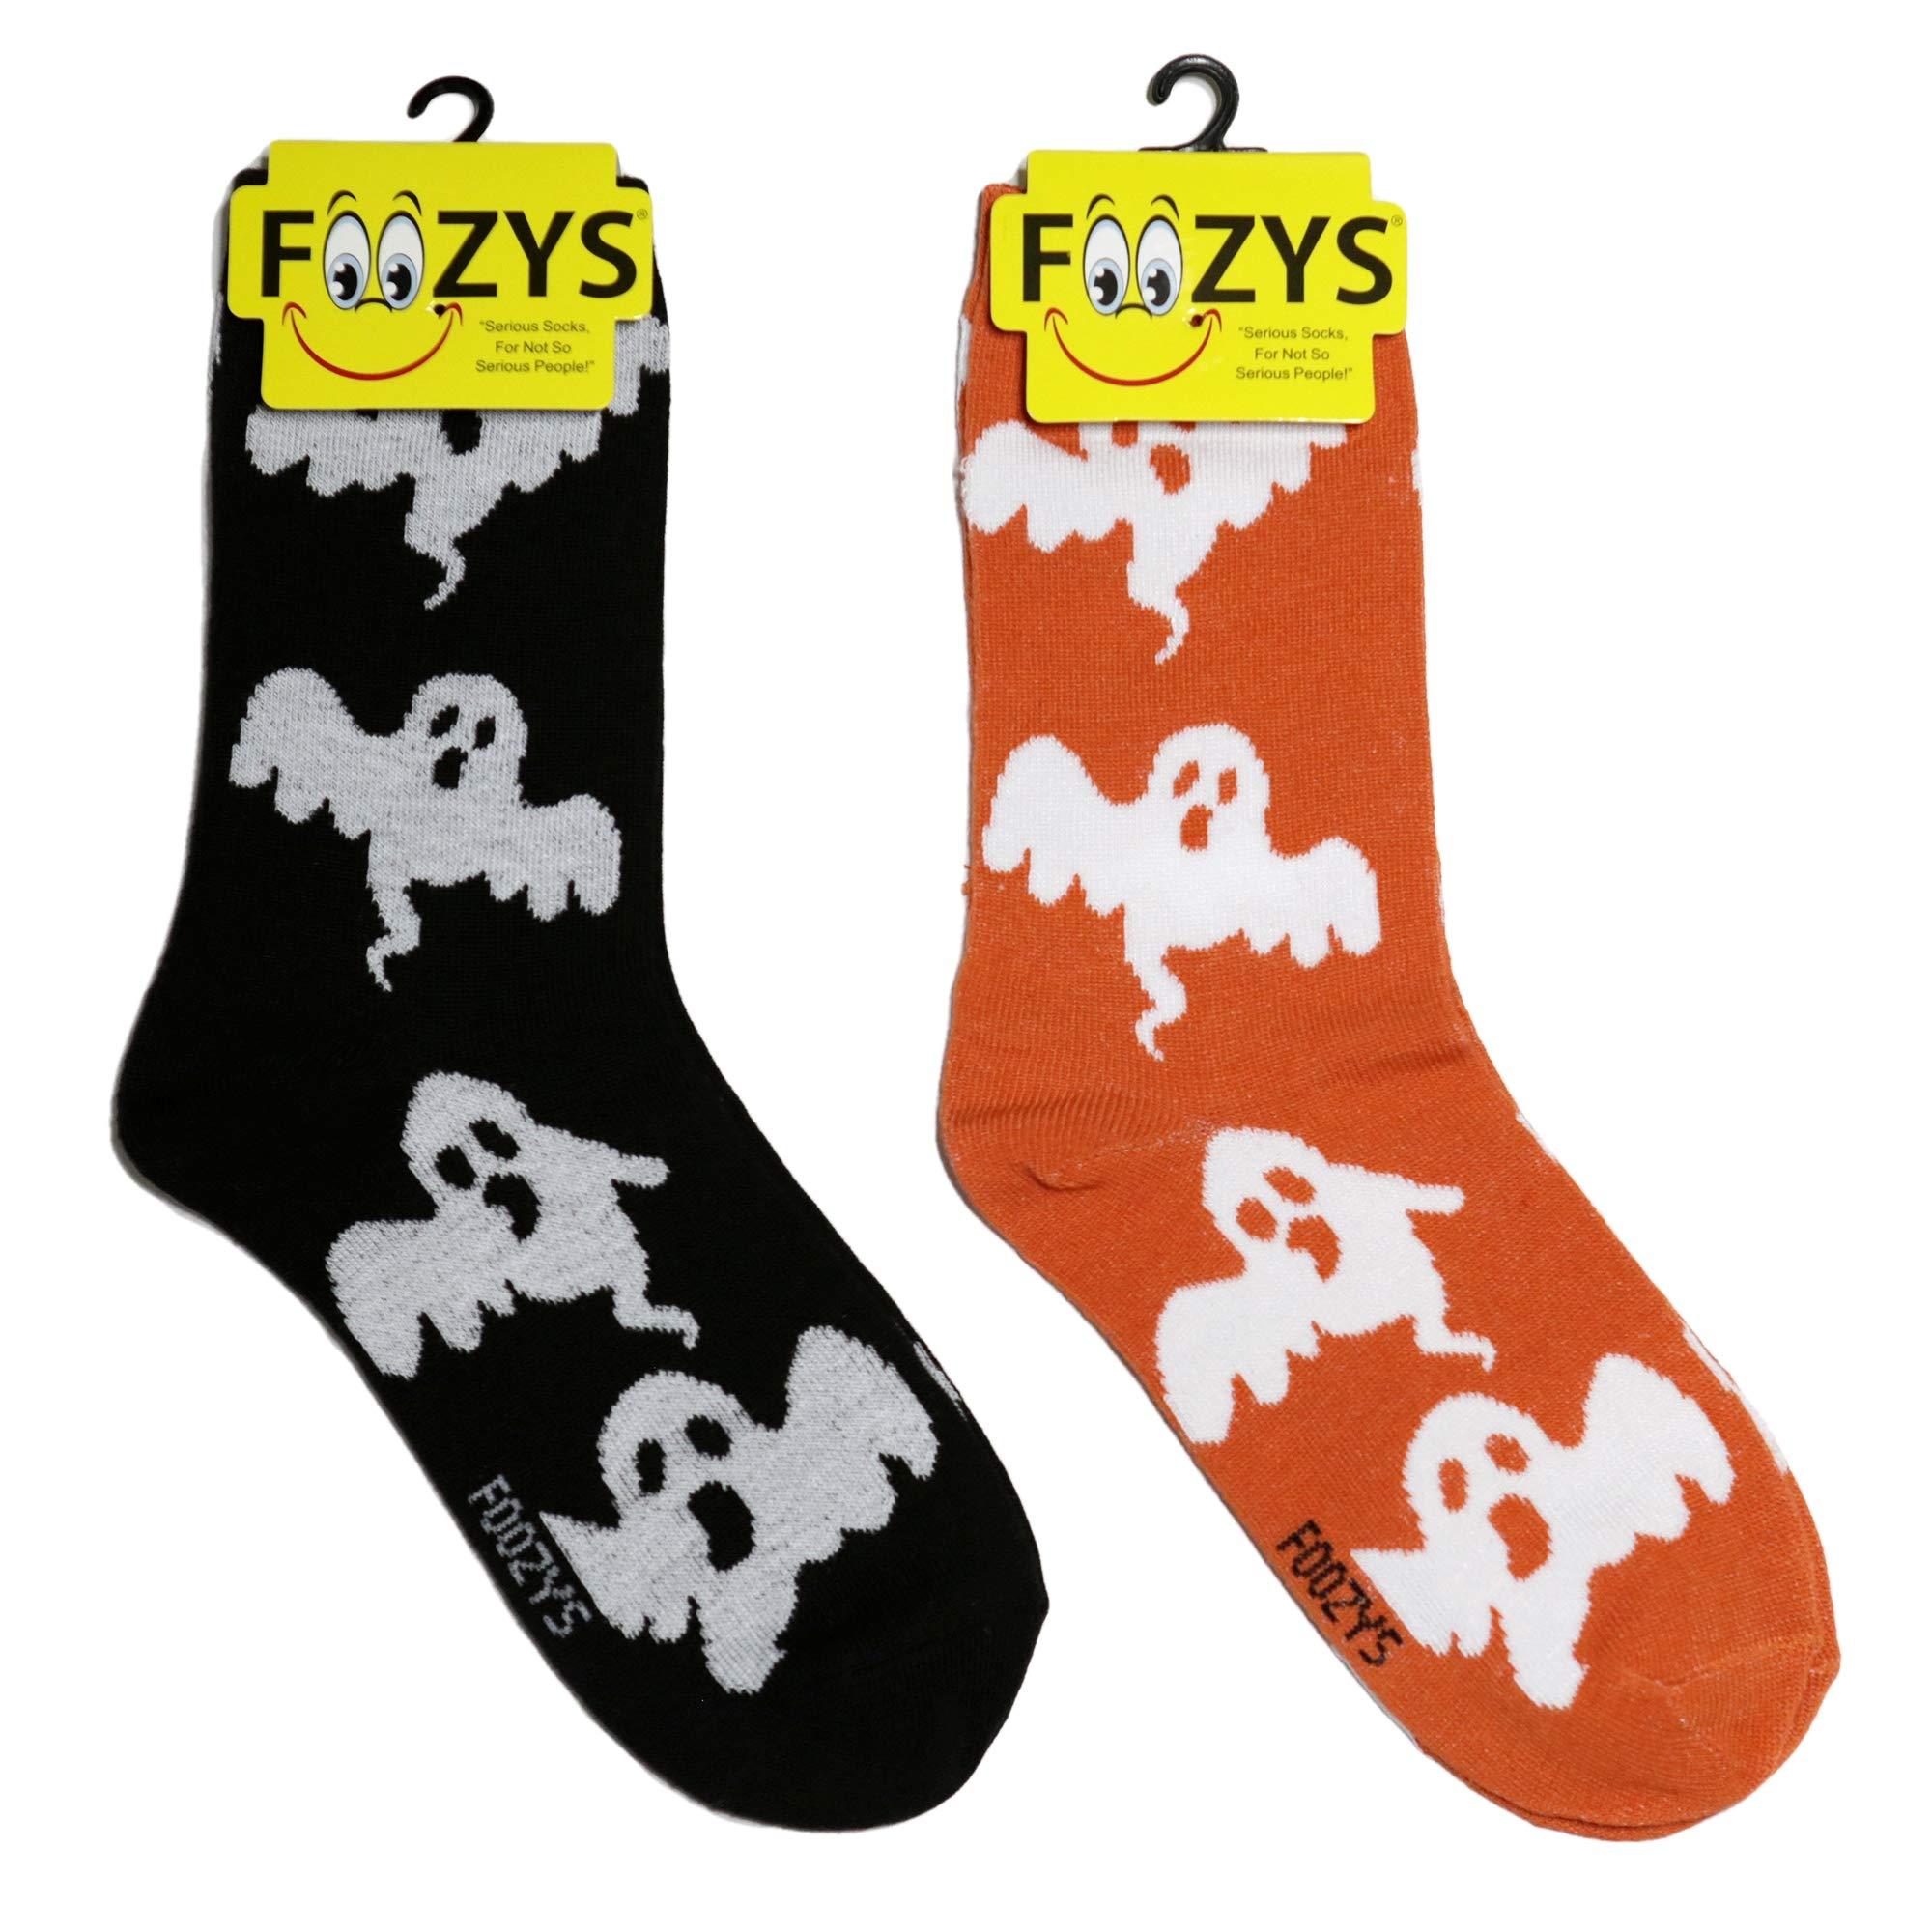 Foozys Women's Crew Socks   Cute Fun Designs Fashion Novelty Socks   2 Pairs